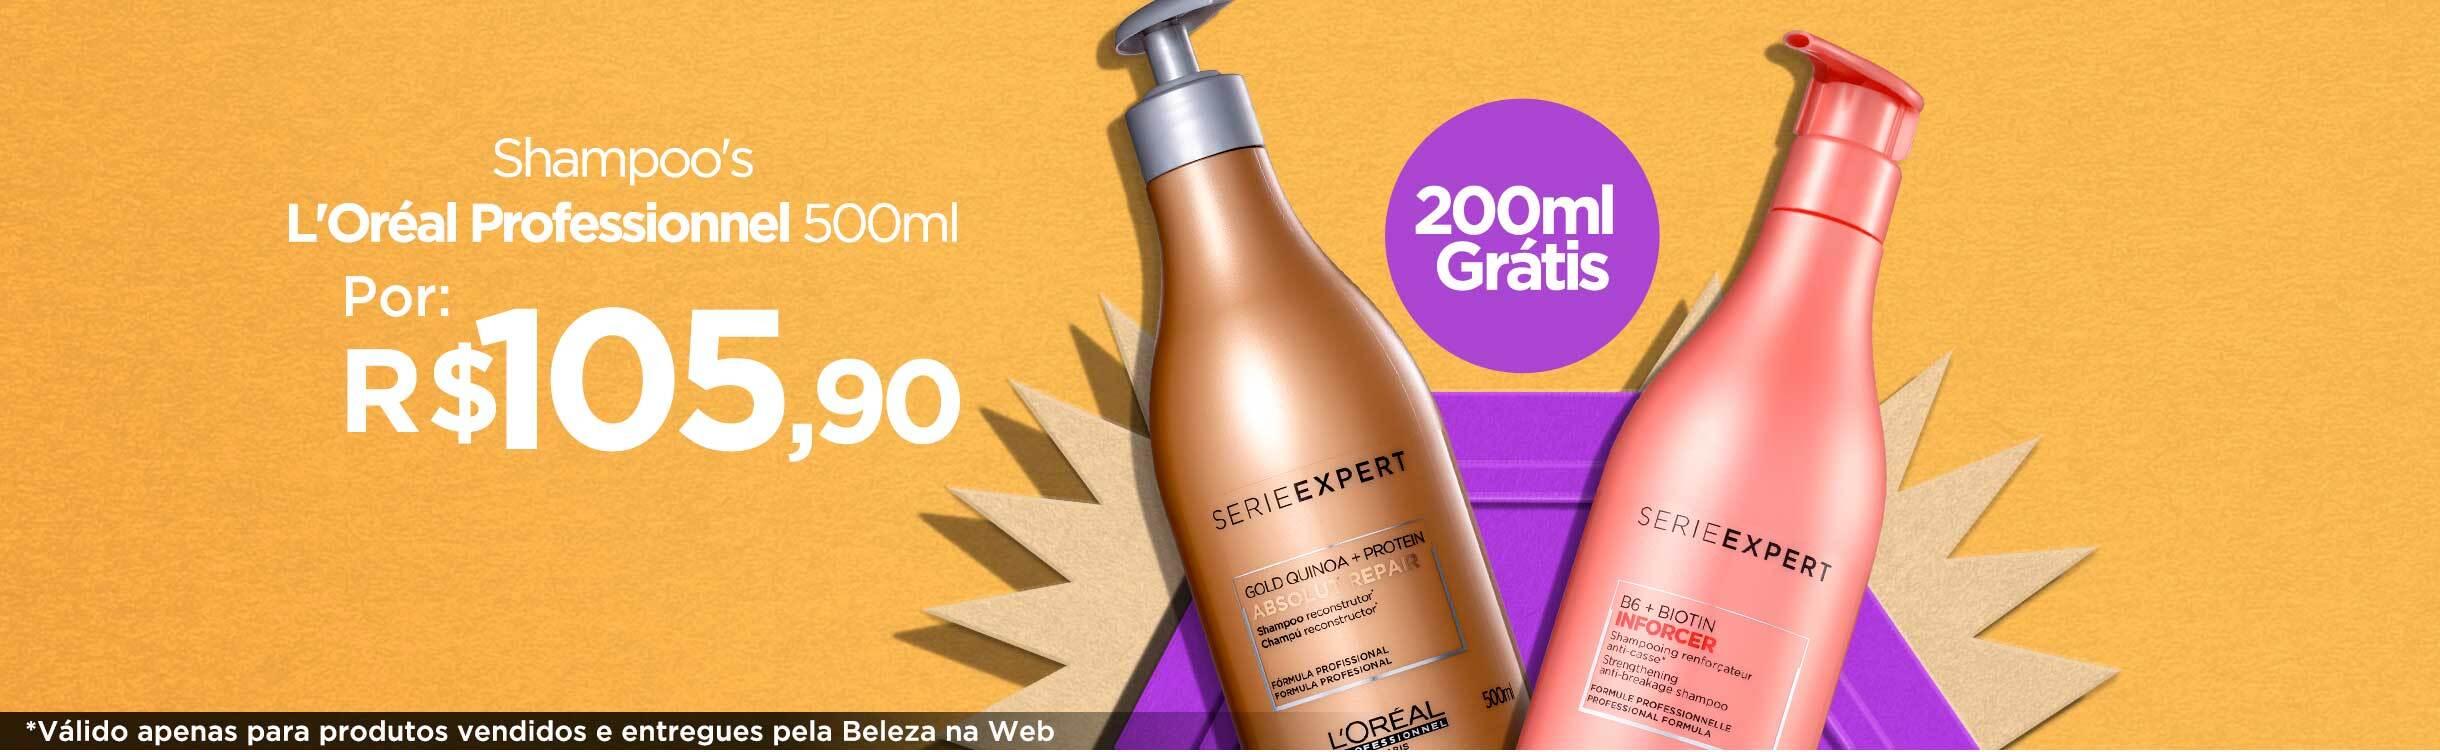 Shampoo's L'Oréal Professionnel   Leve Mais Por Menos